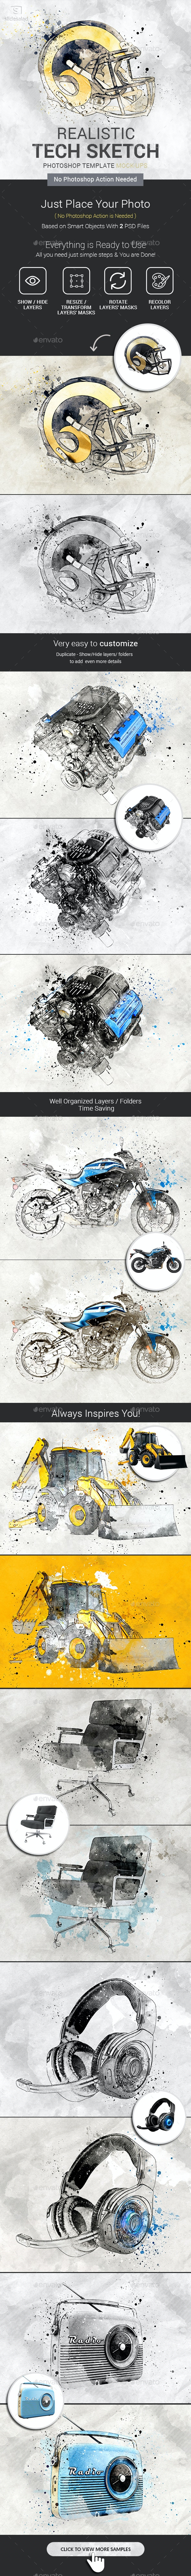 Tech Sketch Photoshop Template Mock-Ups - Photo Templates Graphics